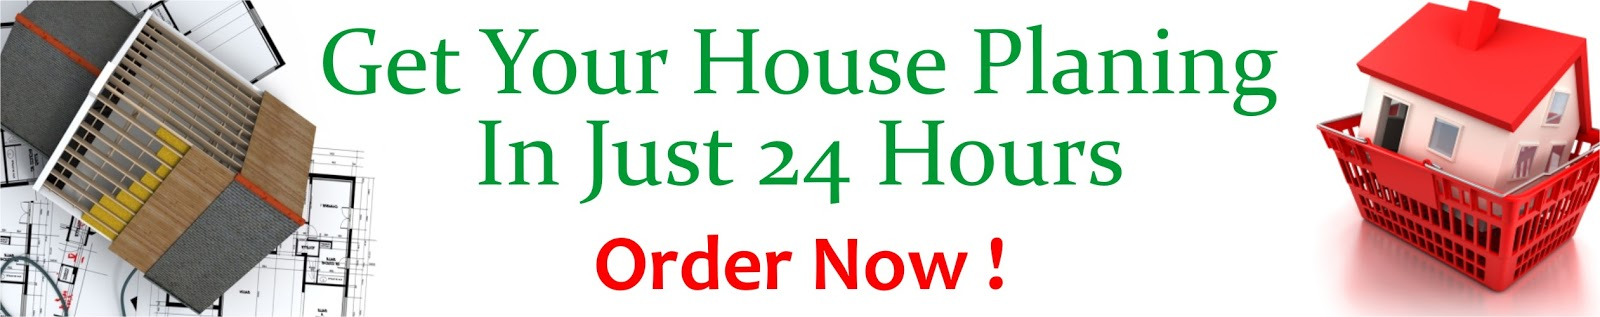 http://3.bp.blogspot.com/-IVcNg6motAw/UR5FqeQnRrI/AAAAAAAAB0Q/L6Jf92uG1EU/s1600/online+house+plan.jpg